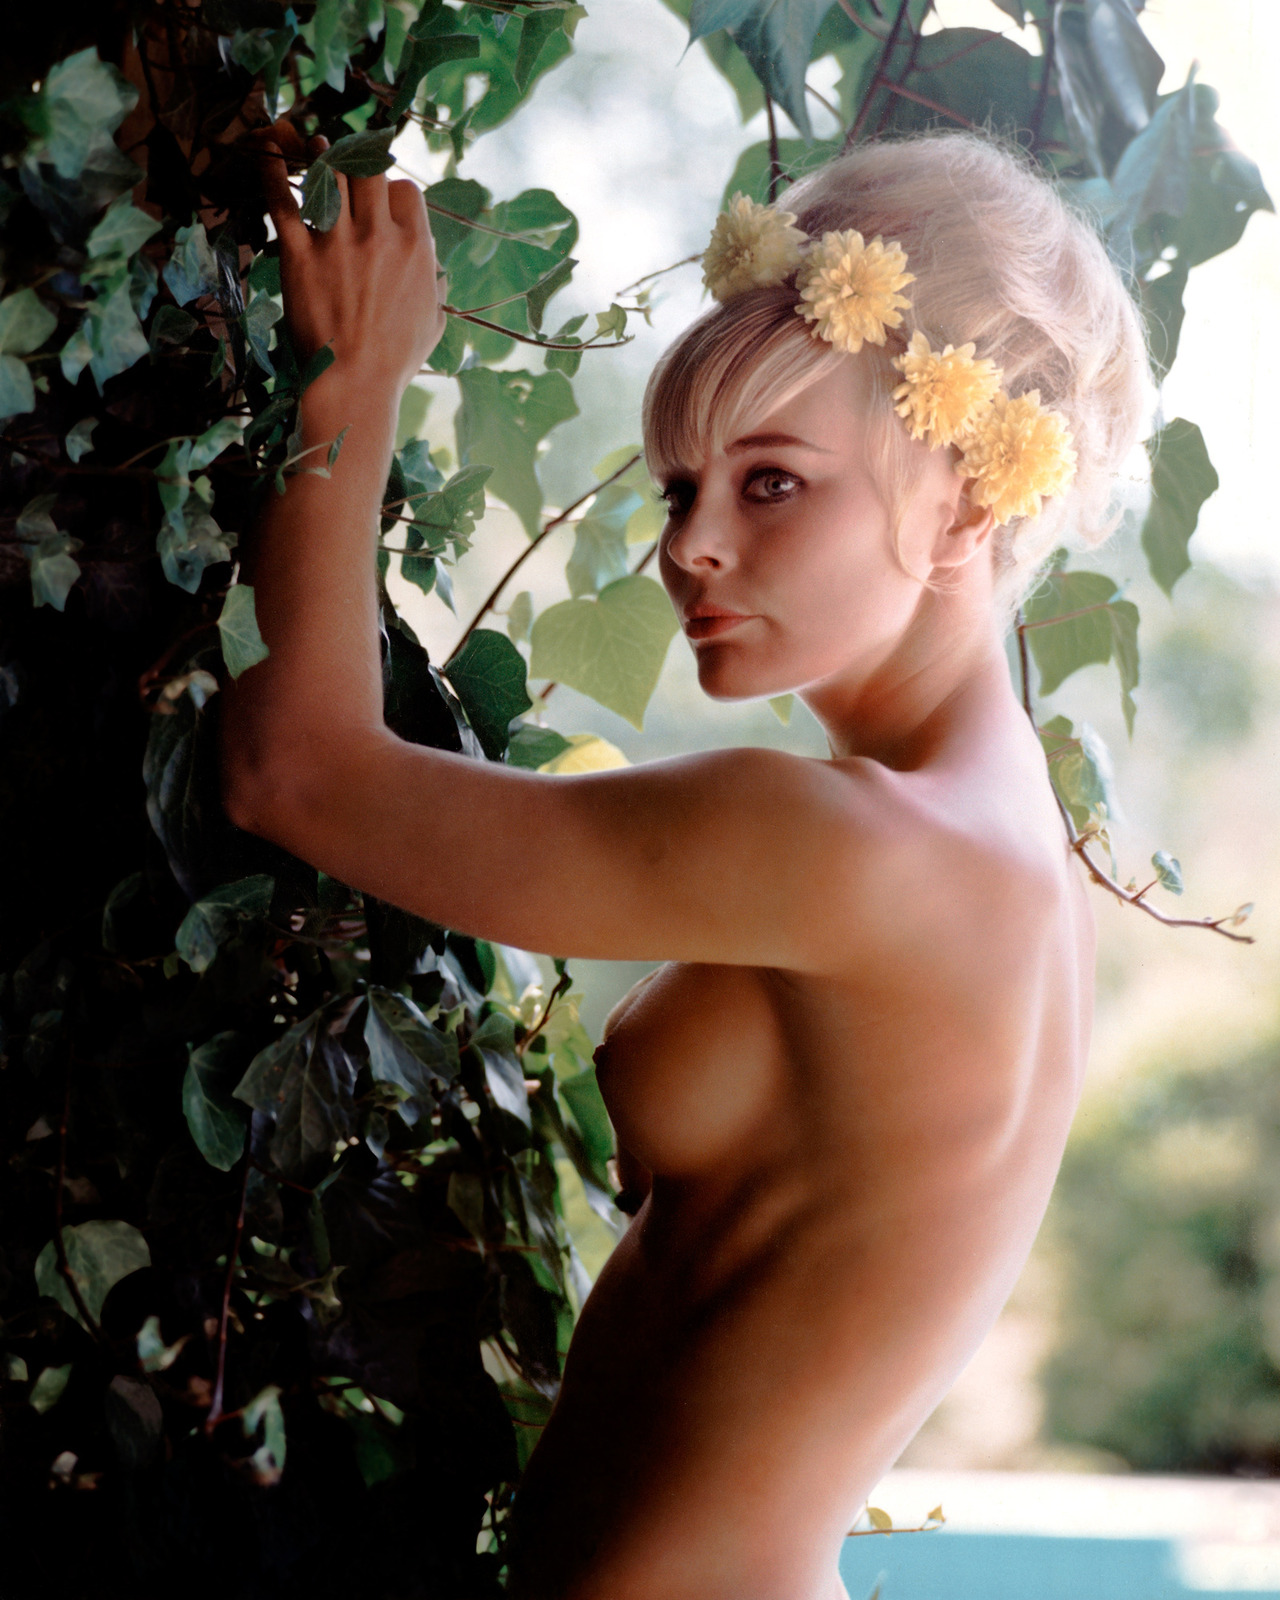 Images Samantha DiGiacomo nudes (94 photos), Tits, Leaked, Boobs, swimsuit 2006